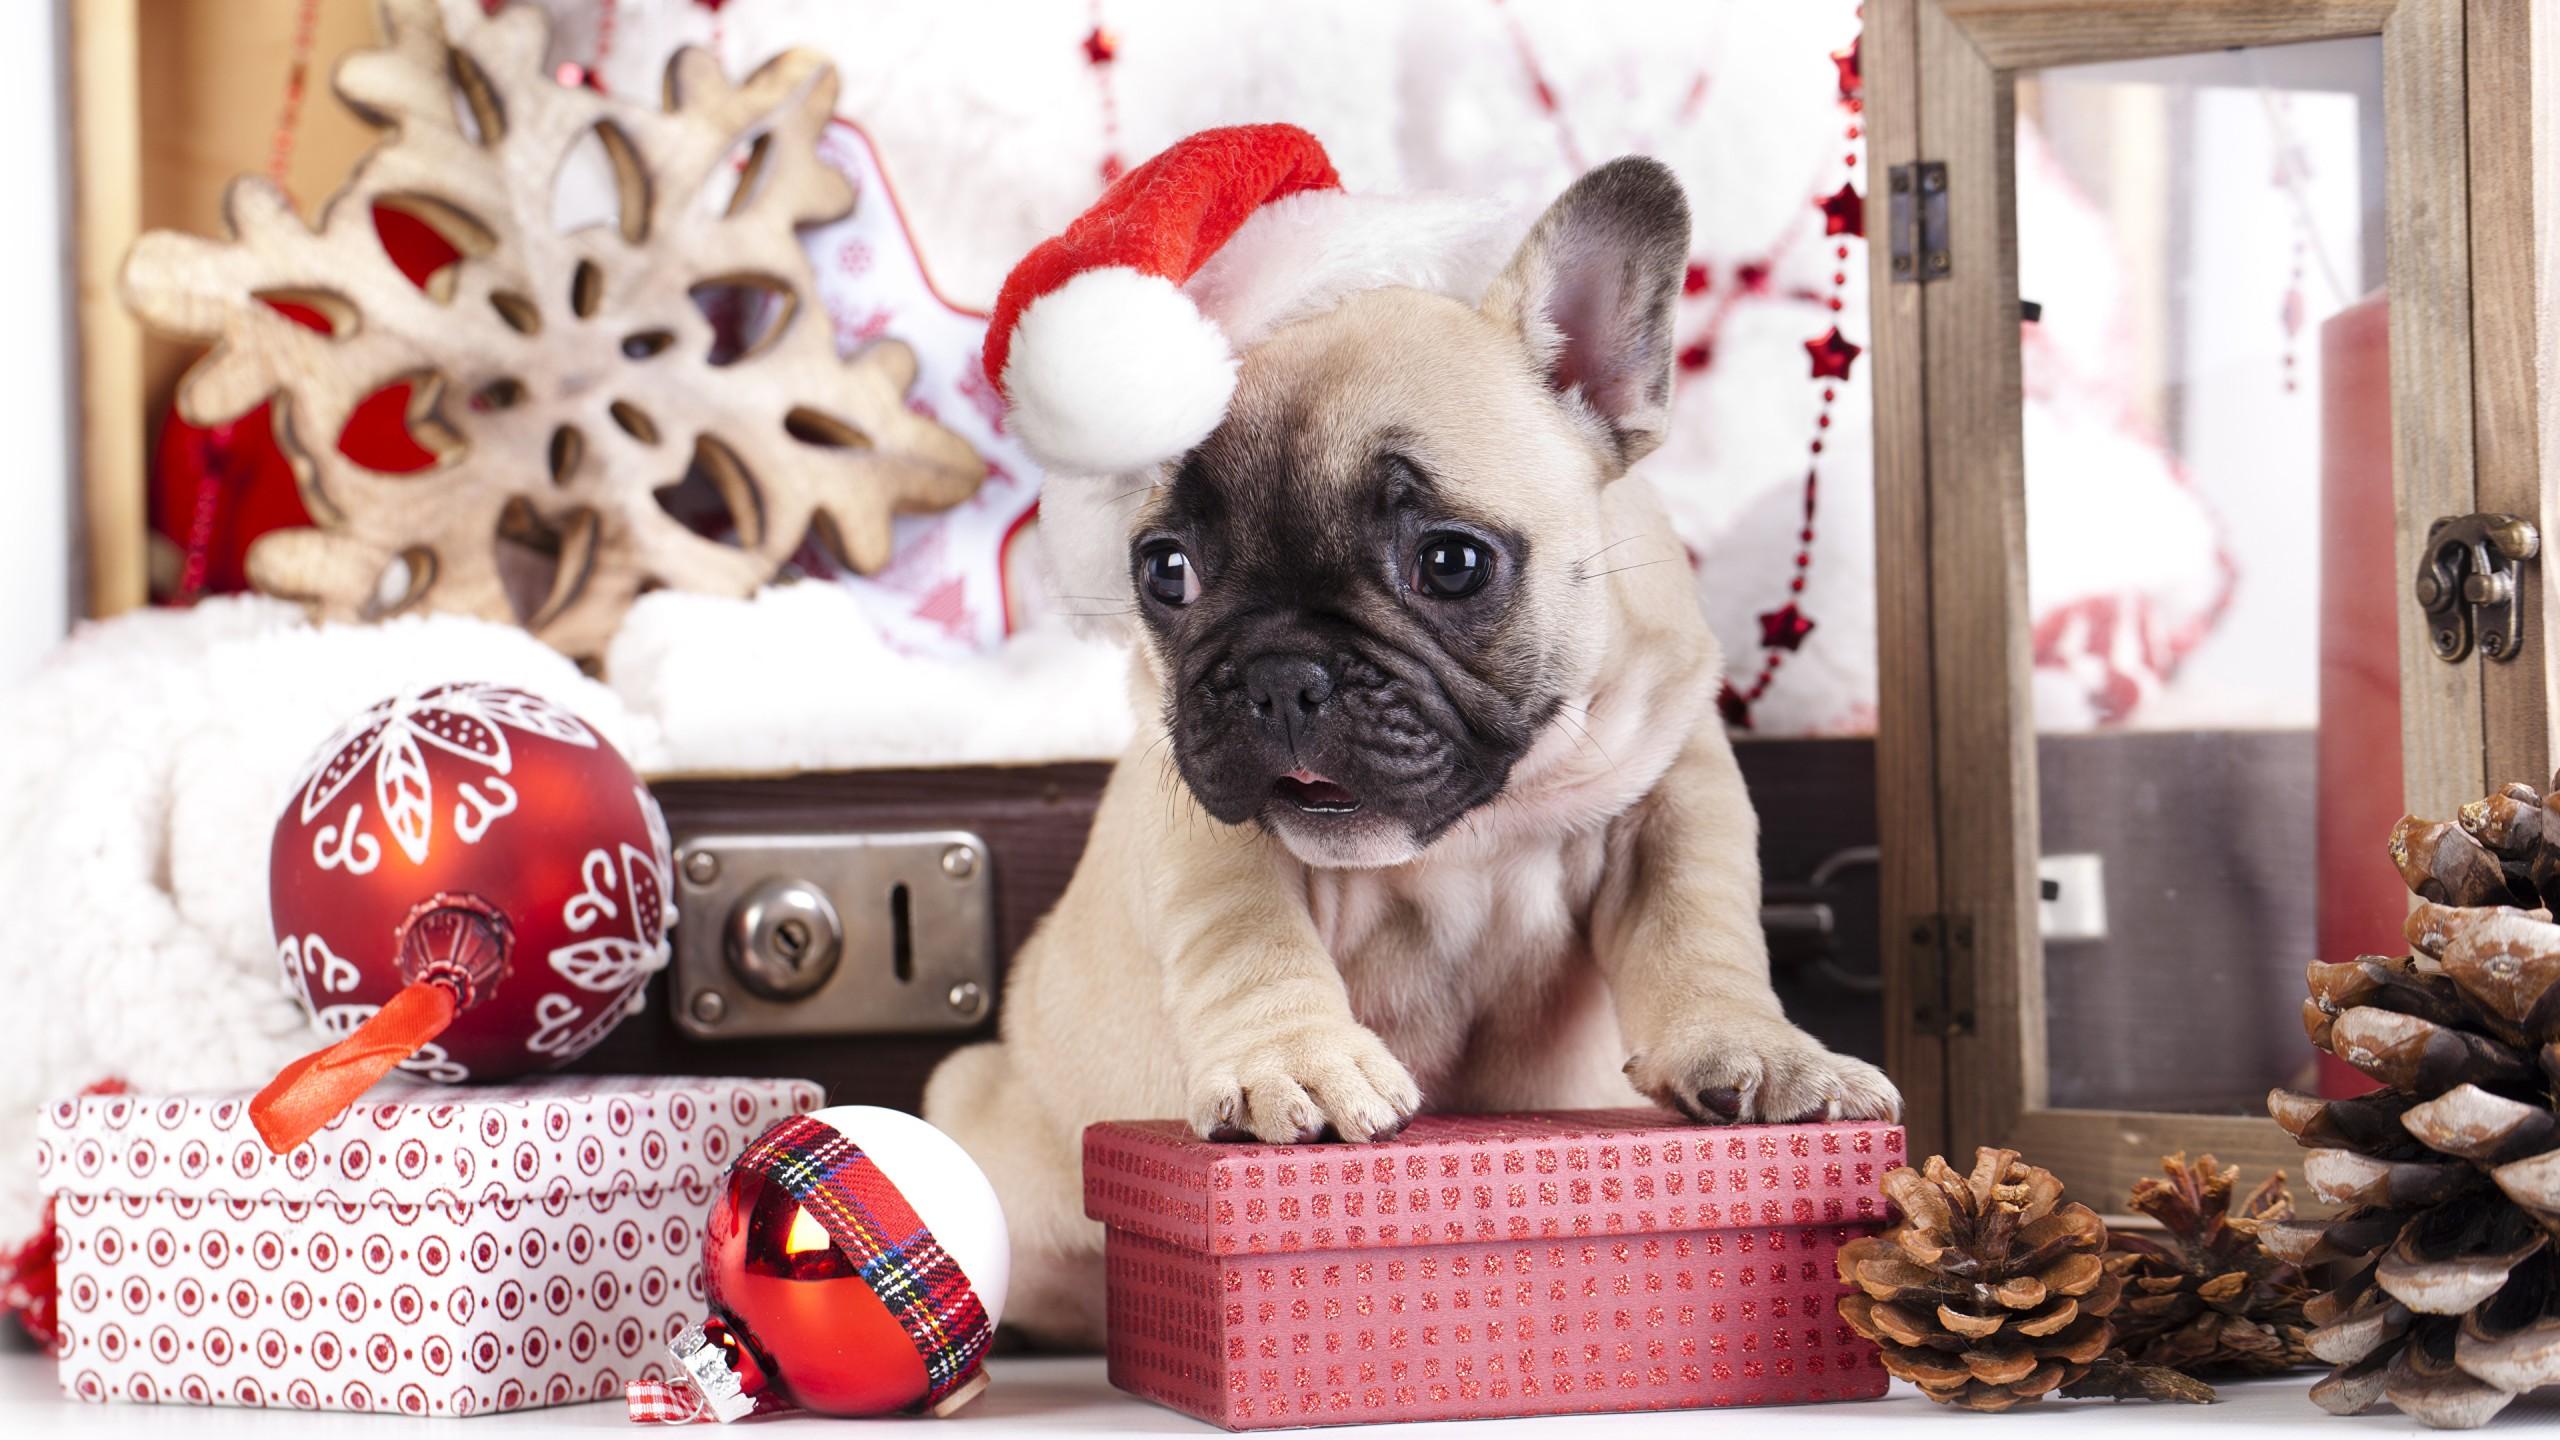 christmas 4k puppy cute animals wallpapers bulldog holidays desktop french wallpapershome puppys vacation holiday pet pets horizontal 2k navidad cat